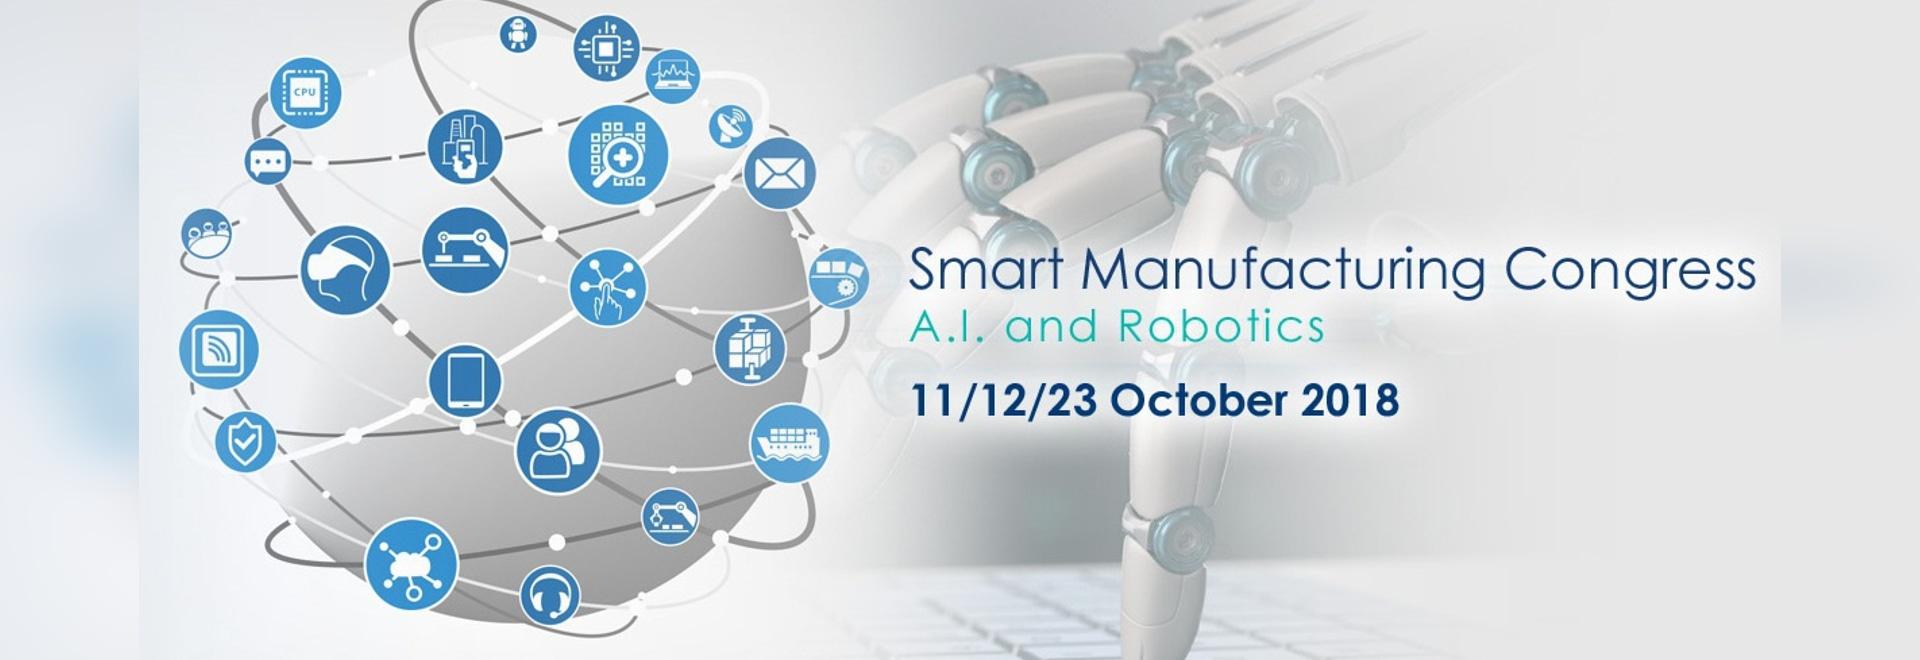 Smart Manufacturing Congress – A.I. and Robotics